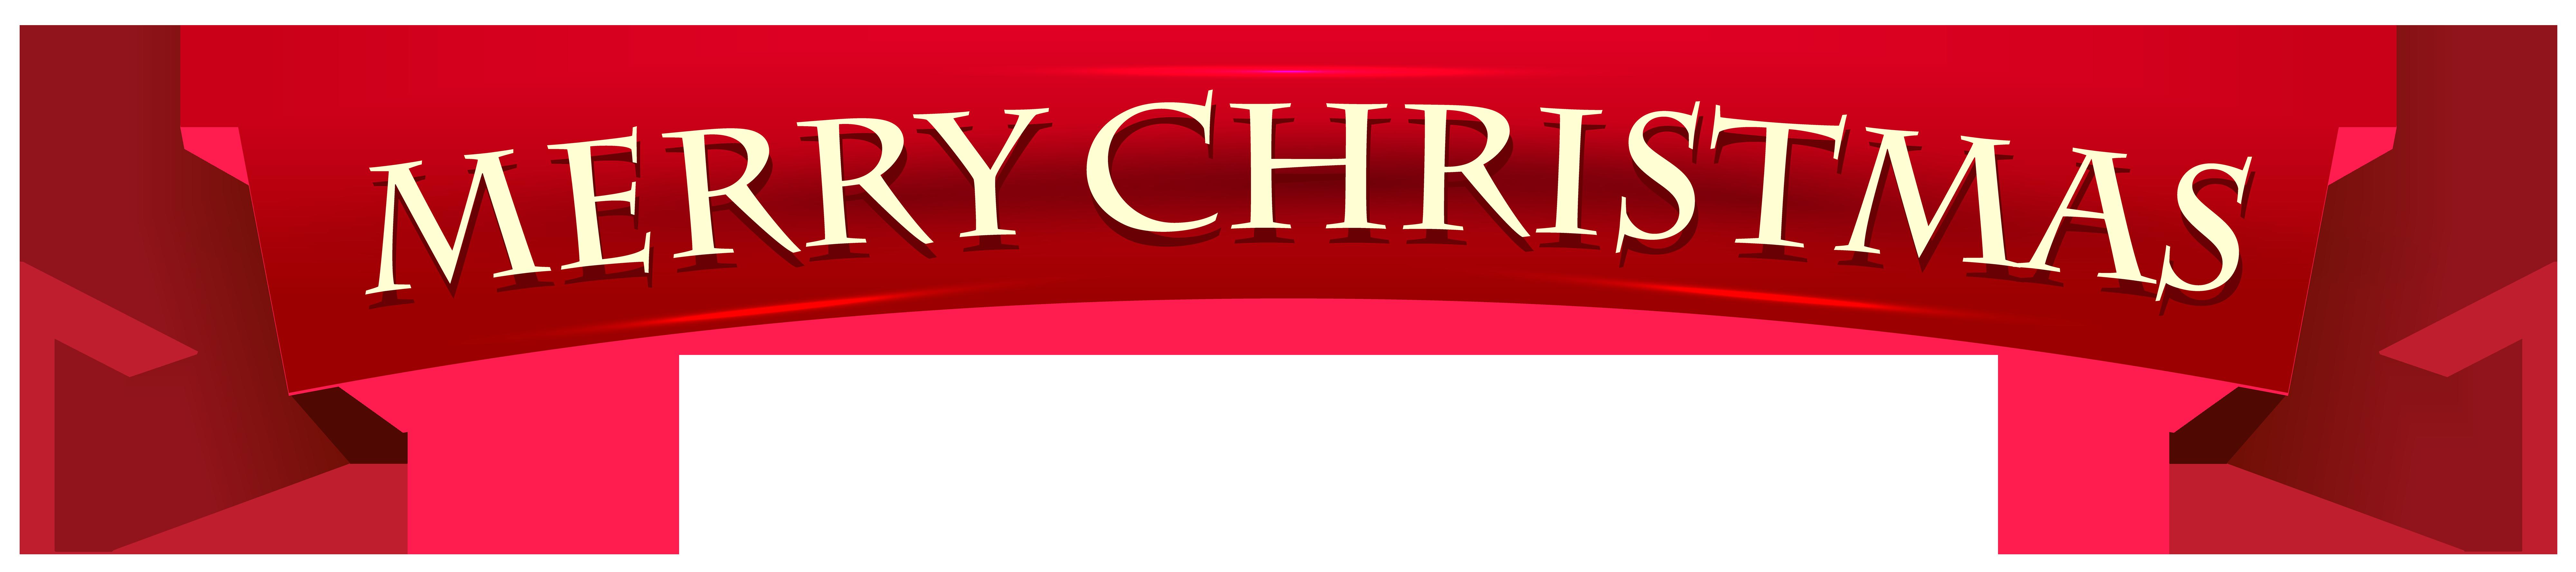 Banner Merry Christmas Transparent Clip Art Image Clip